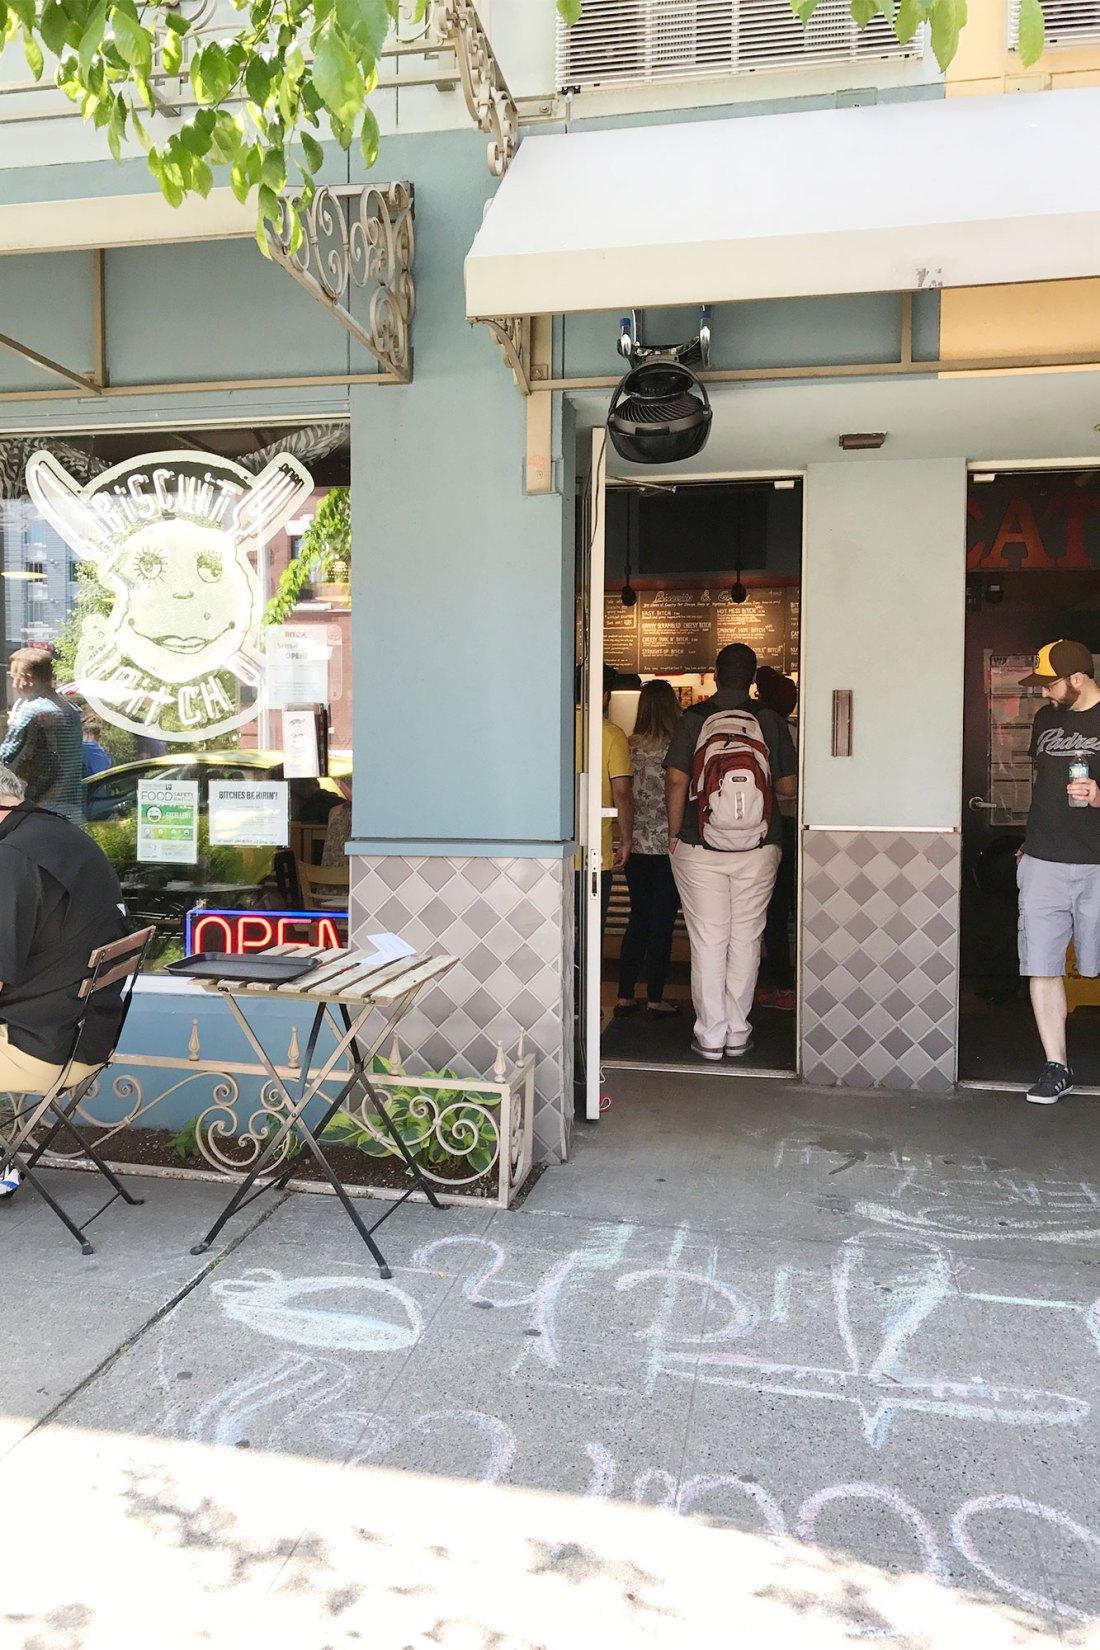 Entrance of Biscuit Bitch restaurant